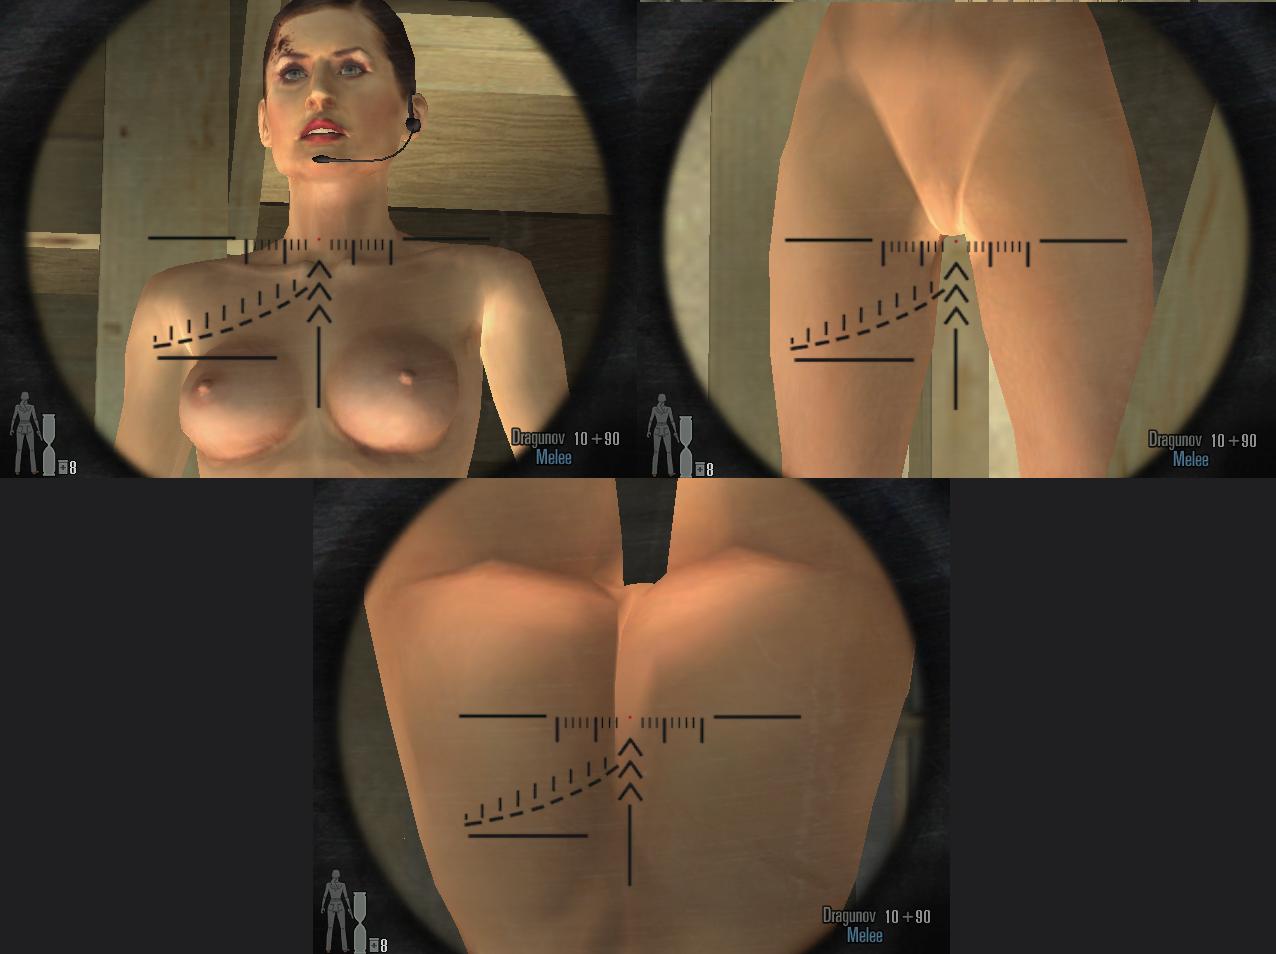 Max payne 2 mods nude xxx porno wifes